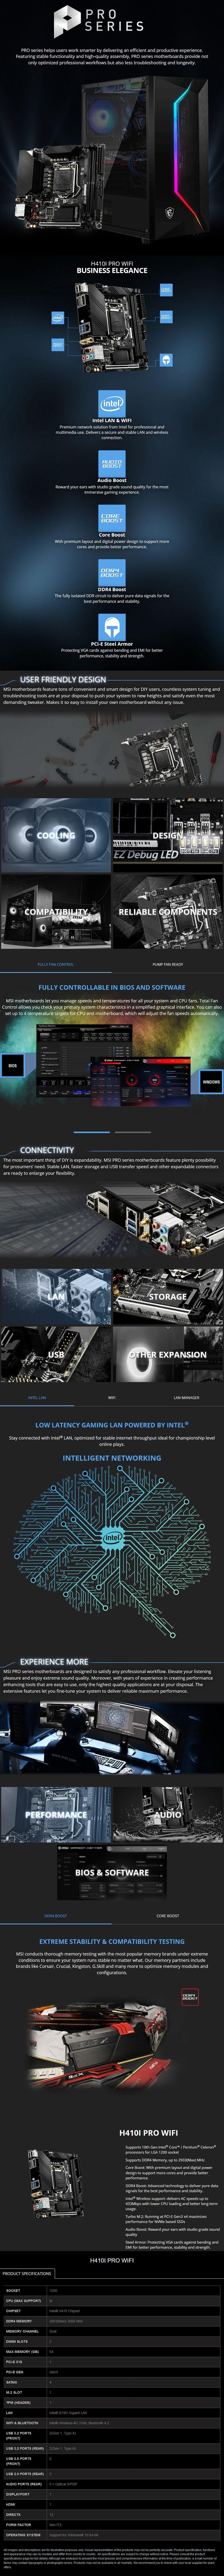 MSI H410I PRO WIFI LGA1200 Mini-ITX Motherboard - Overview 1